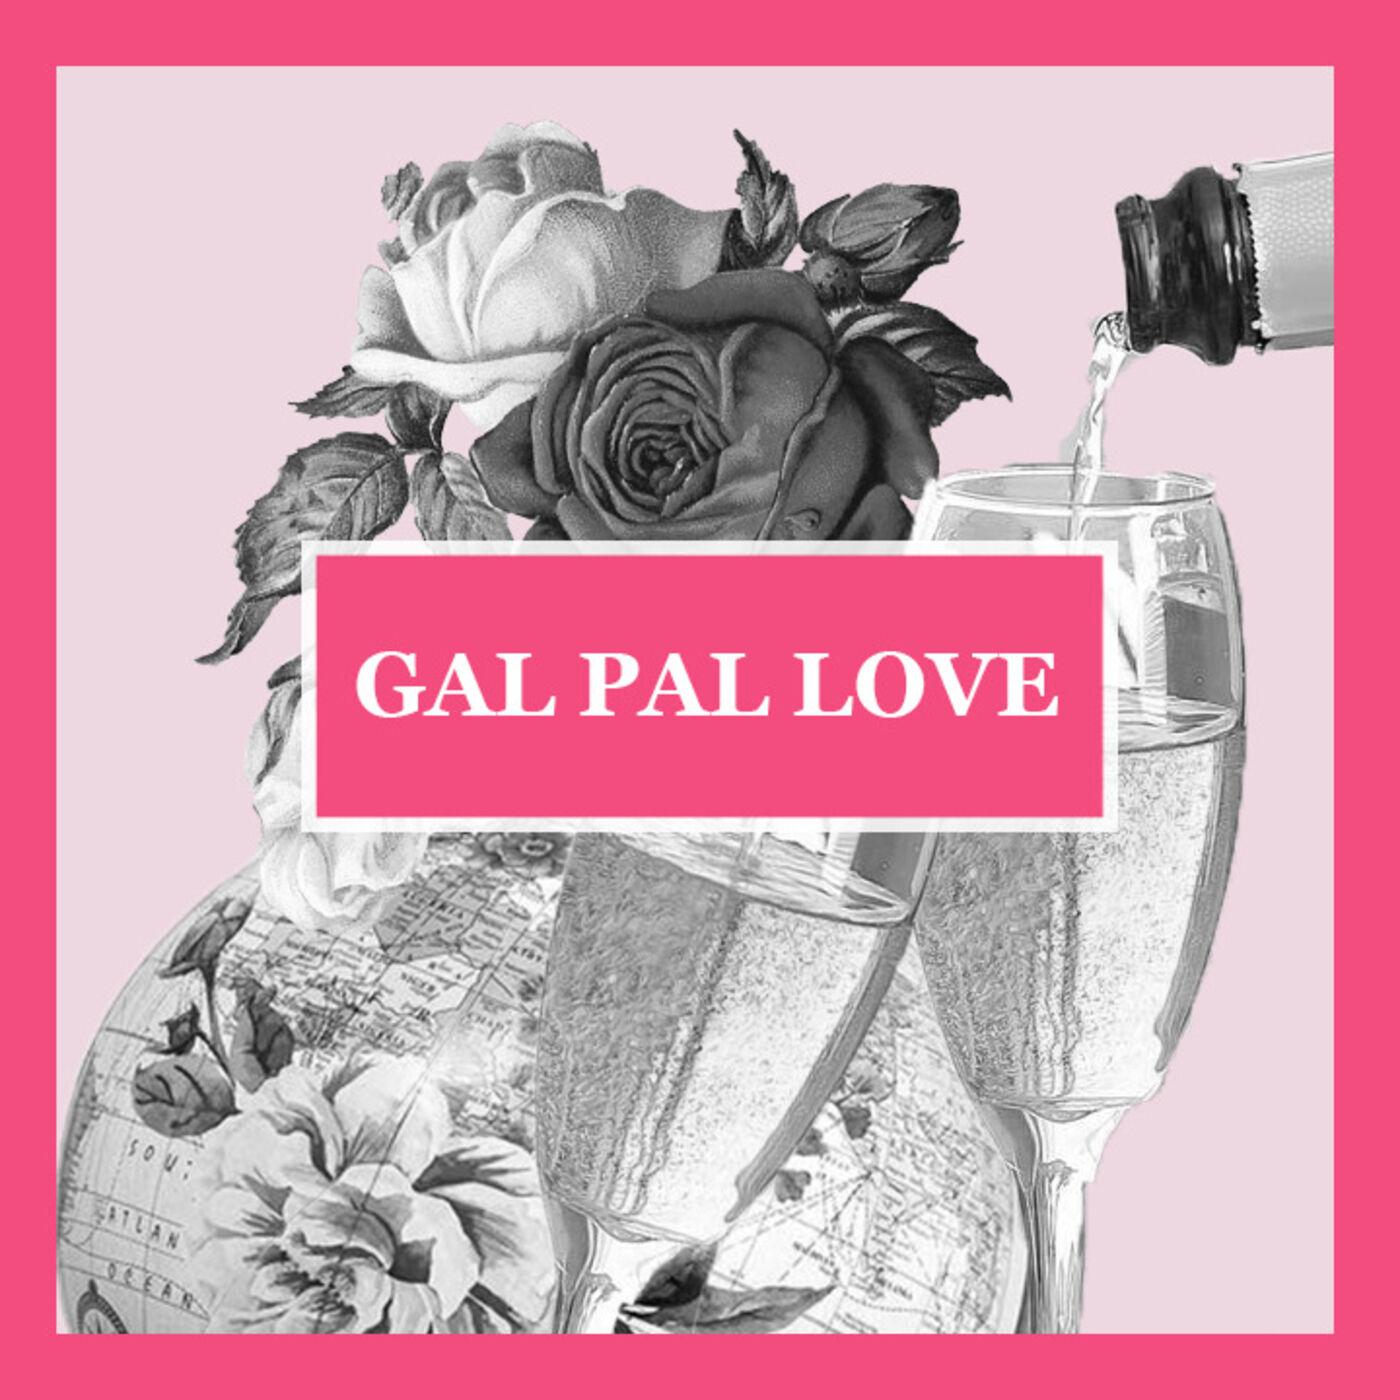 Ep 1 | Gal Pal Love